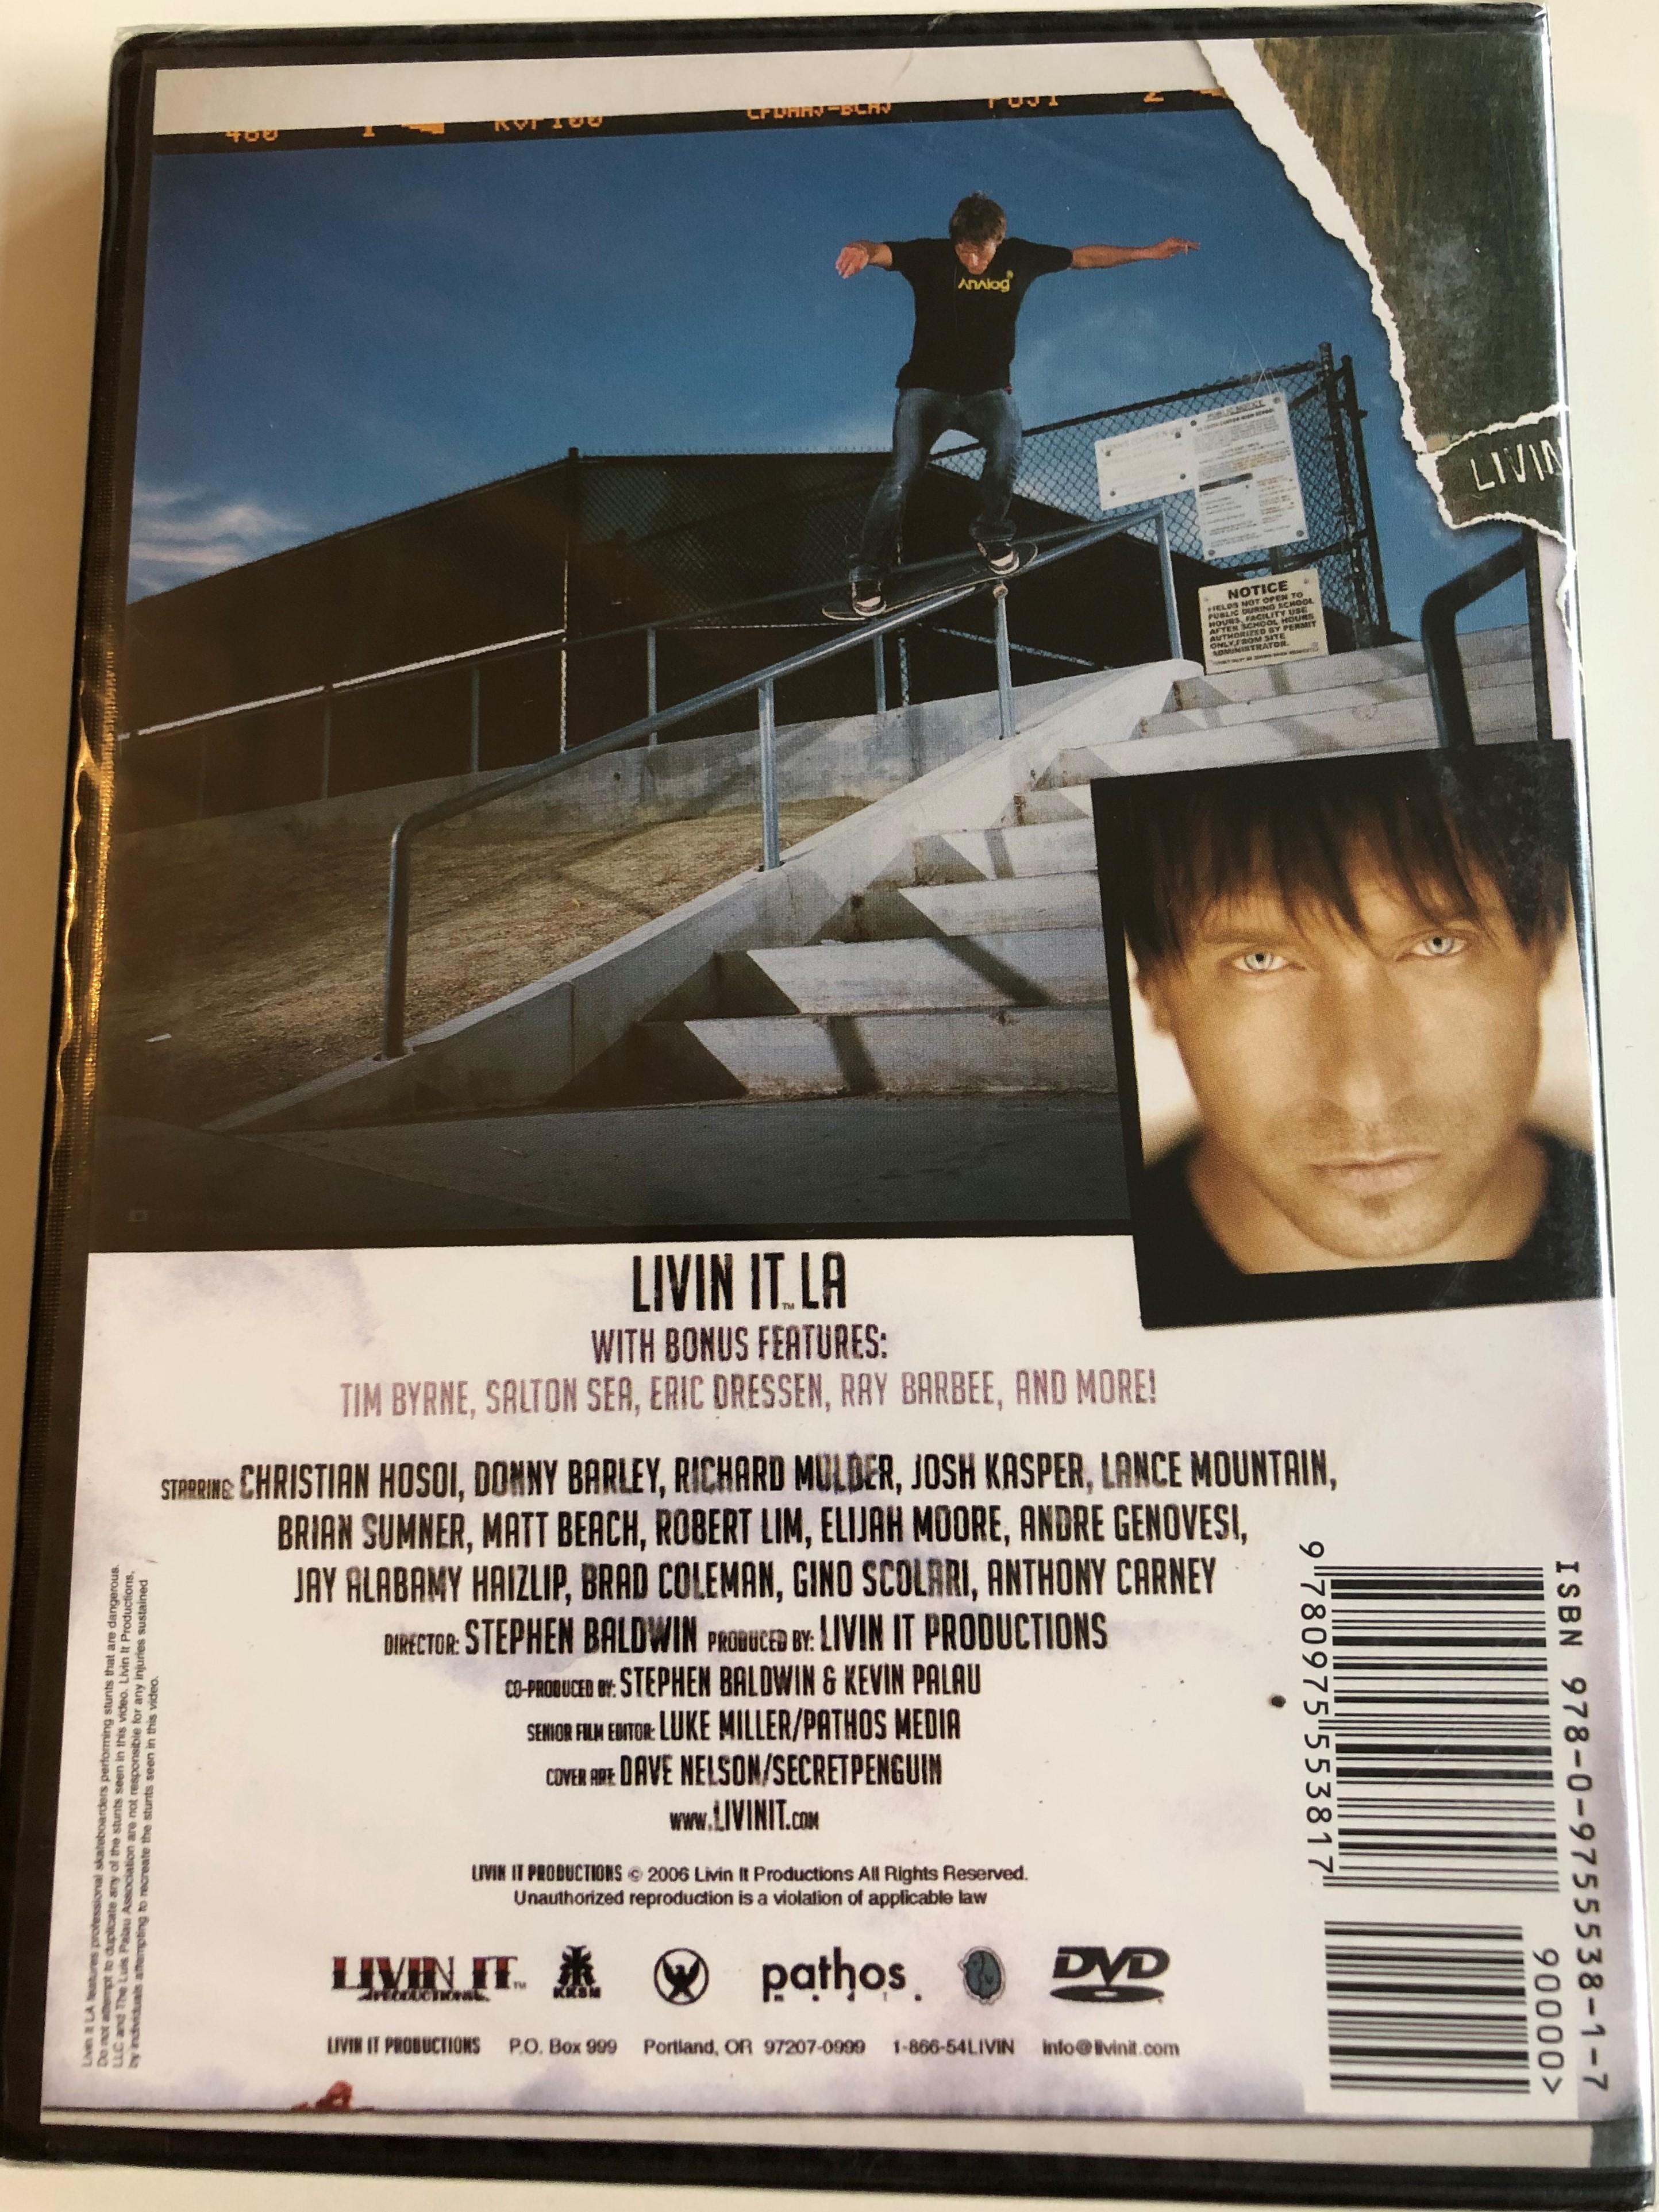 livin-it-la-dvd-2006-directed-by-stephen-baldwin-starring-christian-hosoi-donny-barley-richard-mulder-josh-kasper-lance-mountain-brian-sumner-elijah-moore-skateboarding-film-2-.jpg